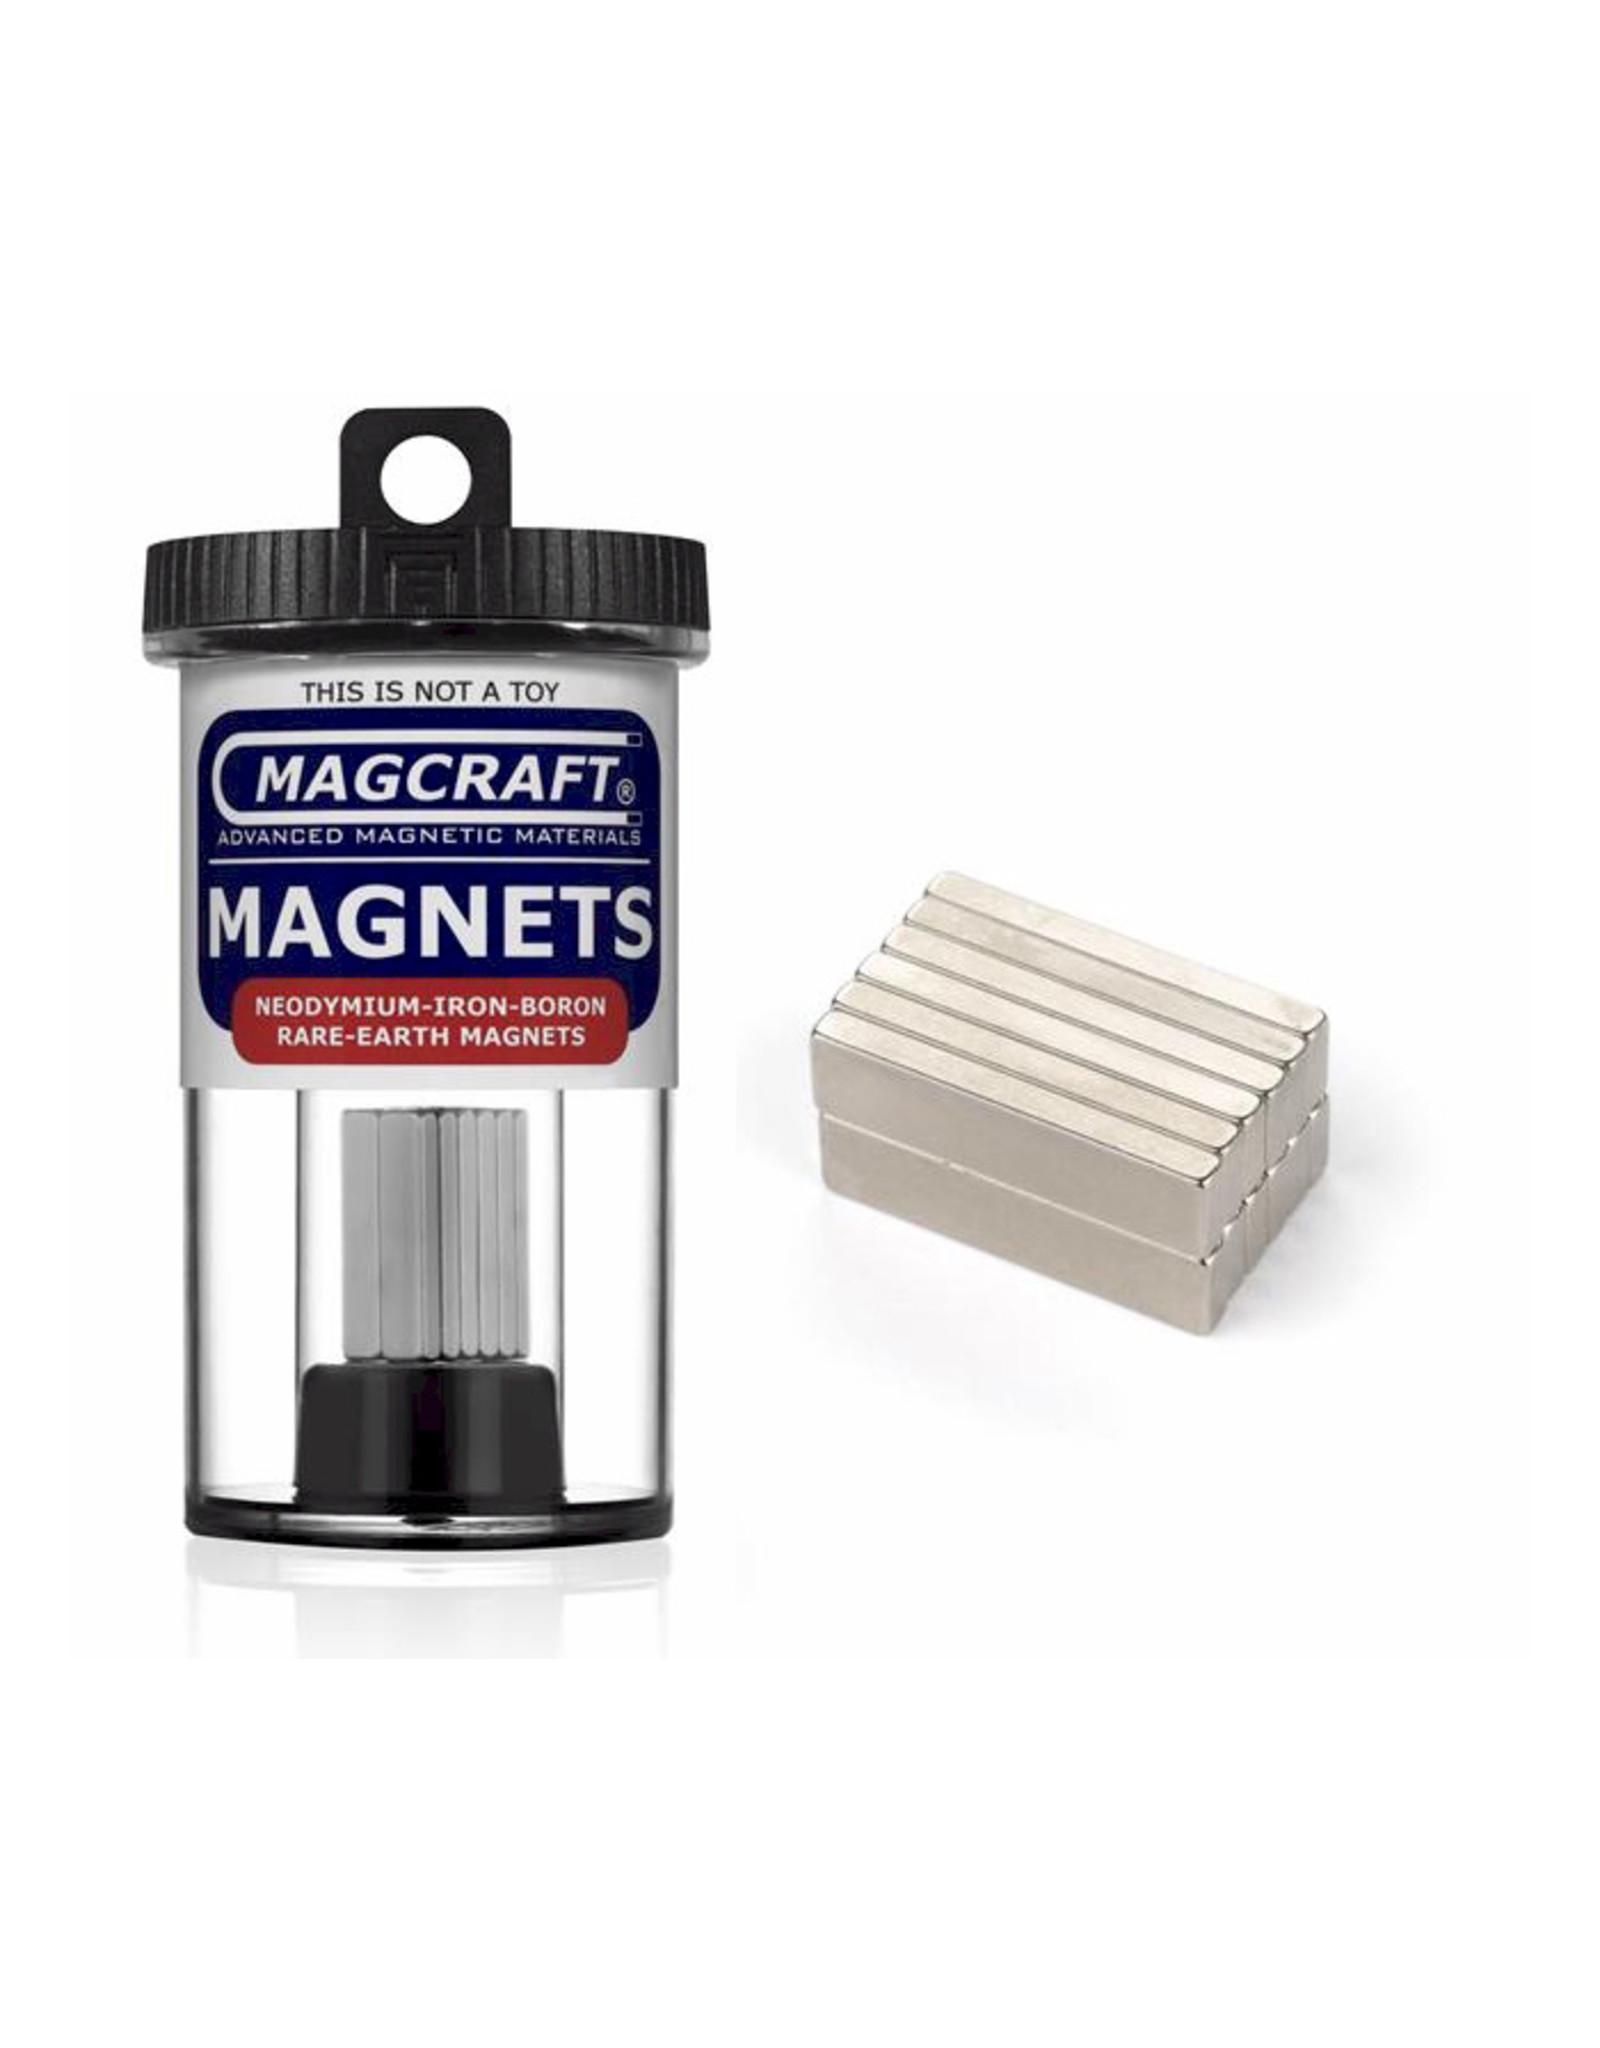 "Magcraft NSN0834 - Block 1"" x 0.25"" x 0.1"" (12 Count)"